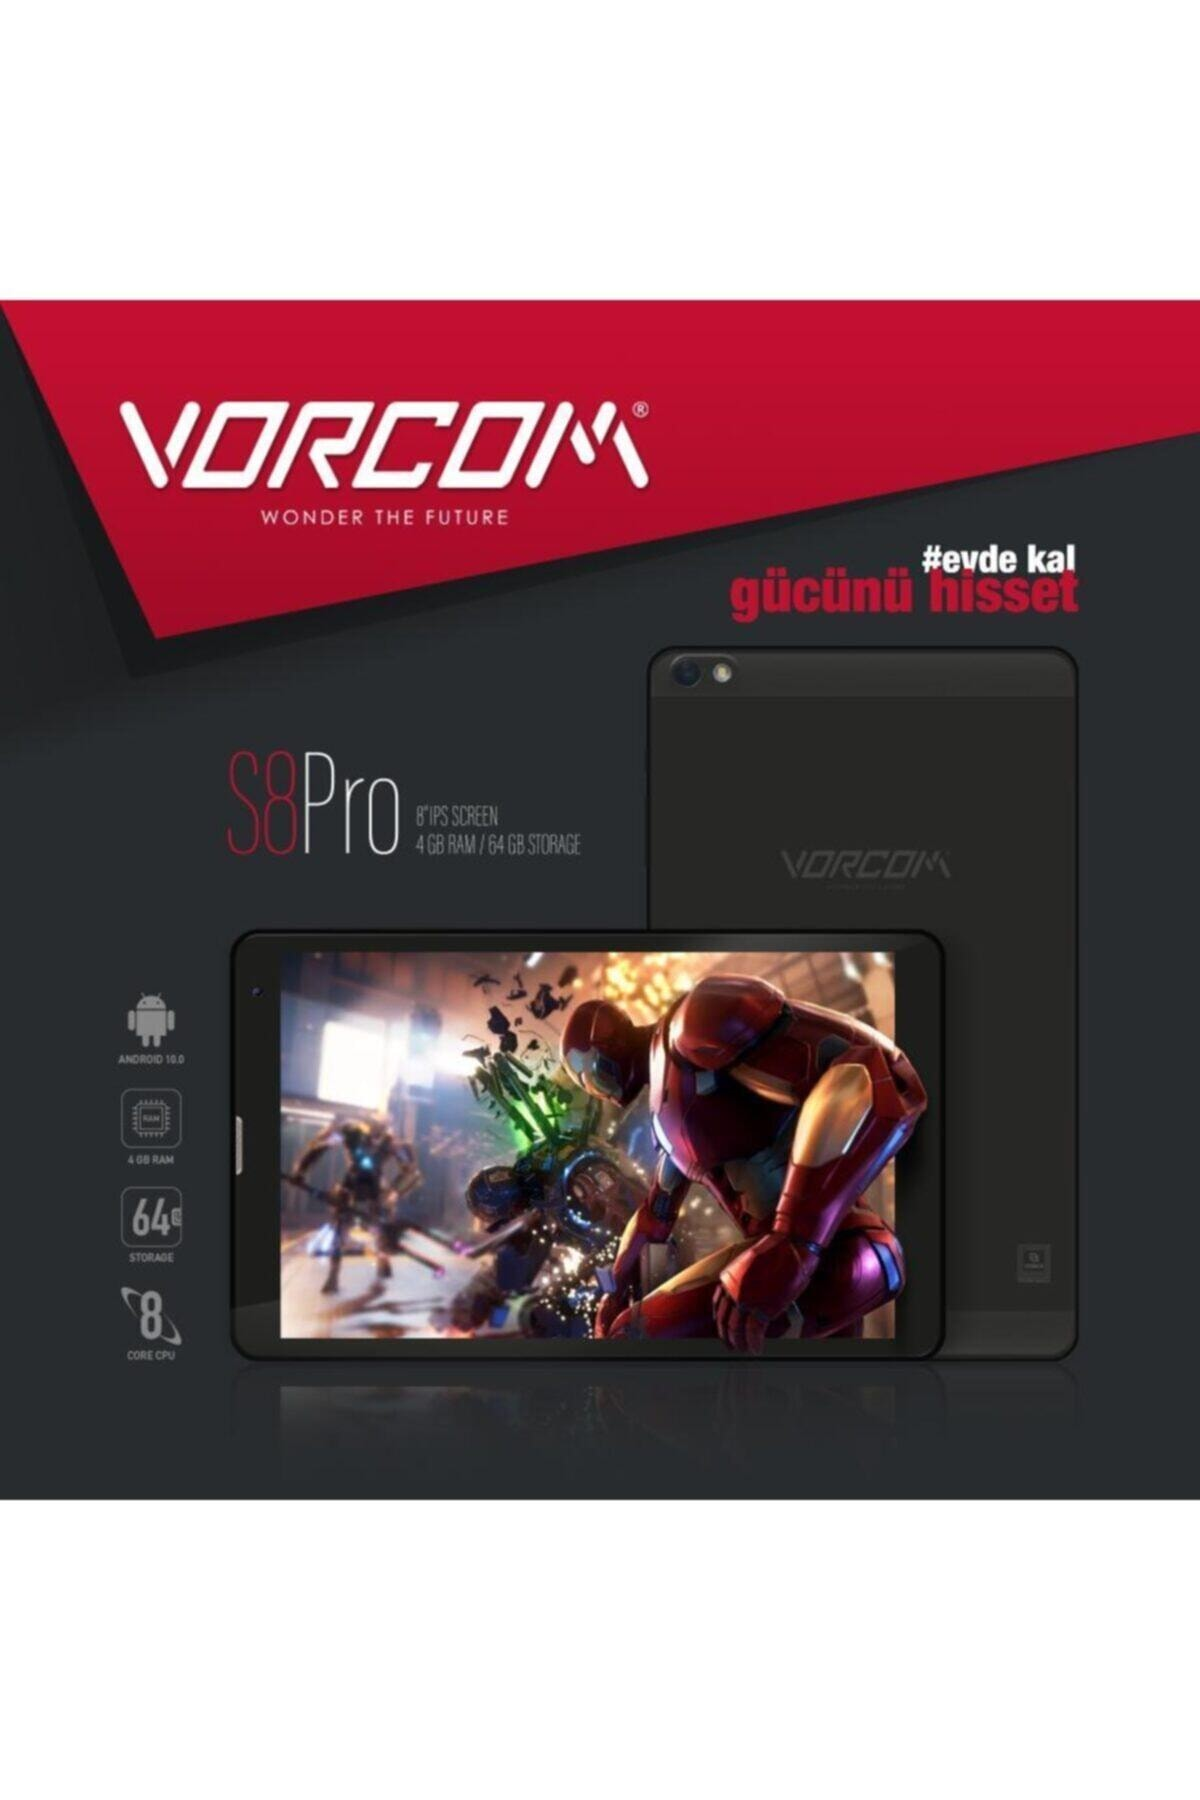 S8 Pro Tablet 4 Gb Ram 64 Gb Hafıza Ips Ekran Eba Zoom Pubg Destekli